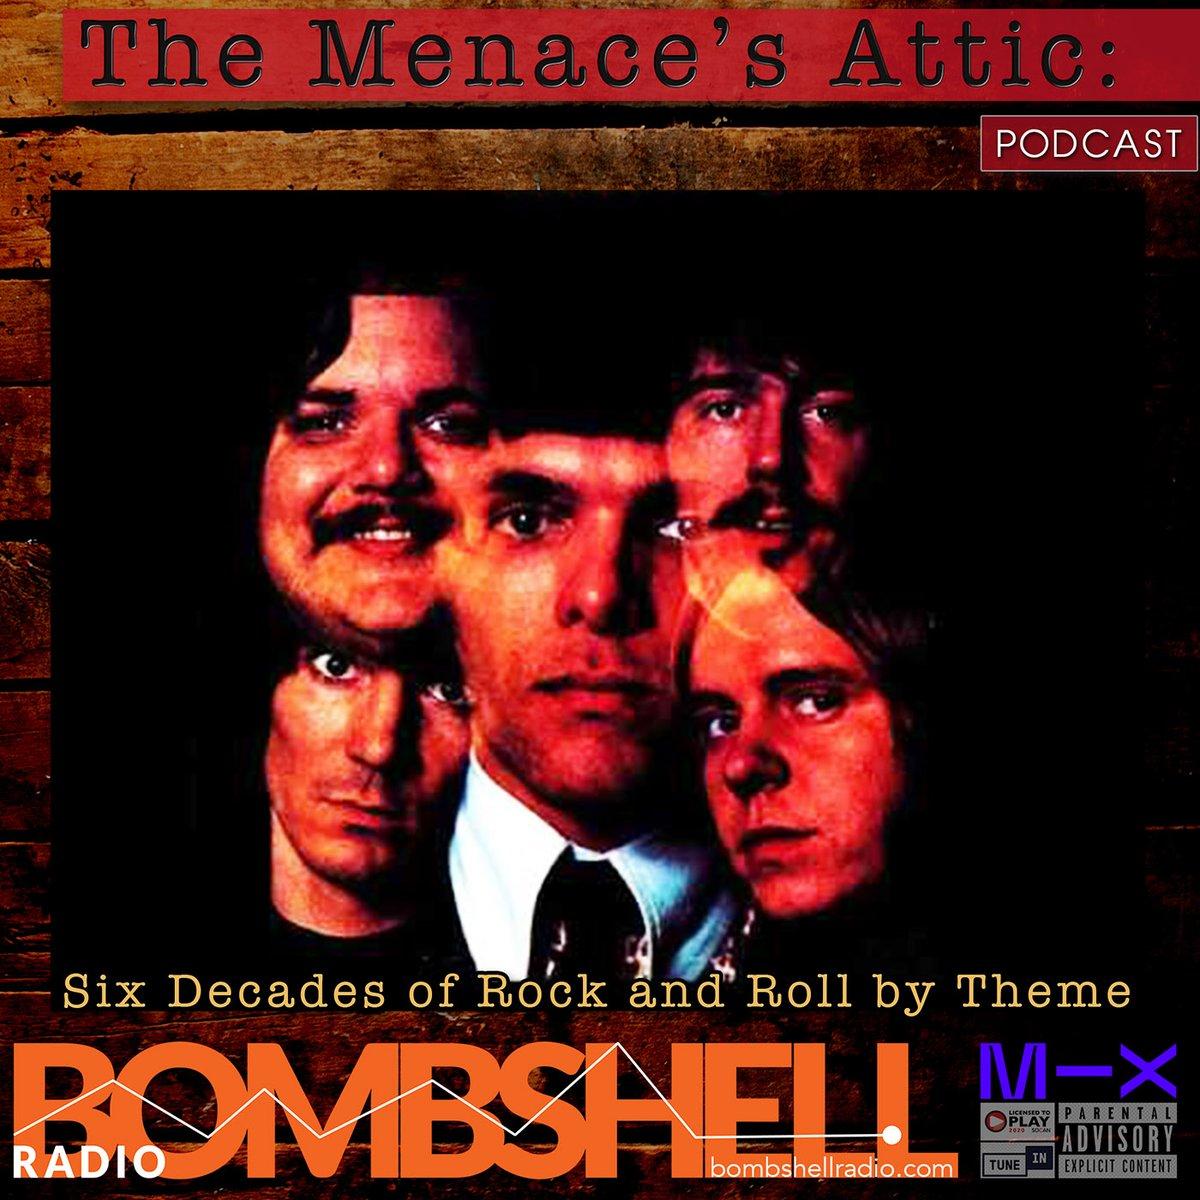 Join us    24-7 Join Us! Wednesday  The Menaces Attic 1pm-2pm EST  #classics,  #pop,  #rock , #classicrock,  #themenacesattic,    #bombshellradio